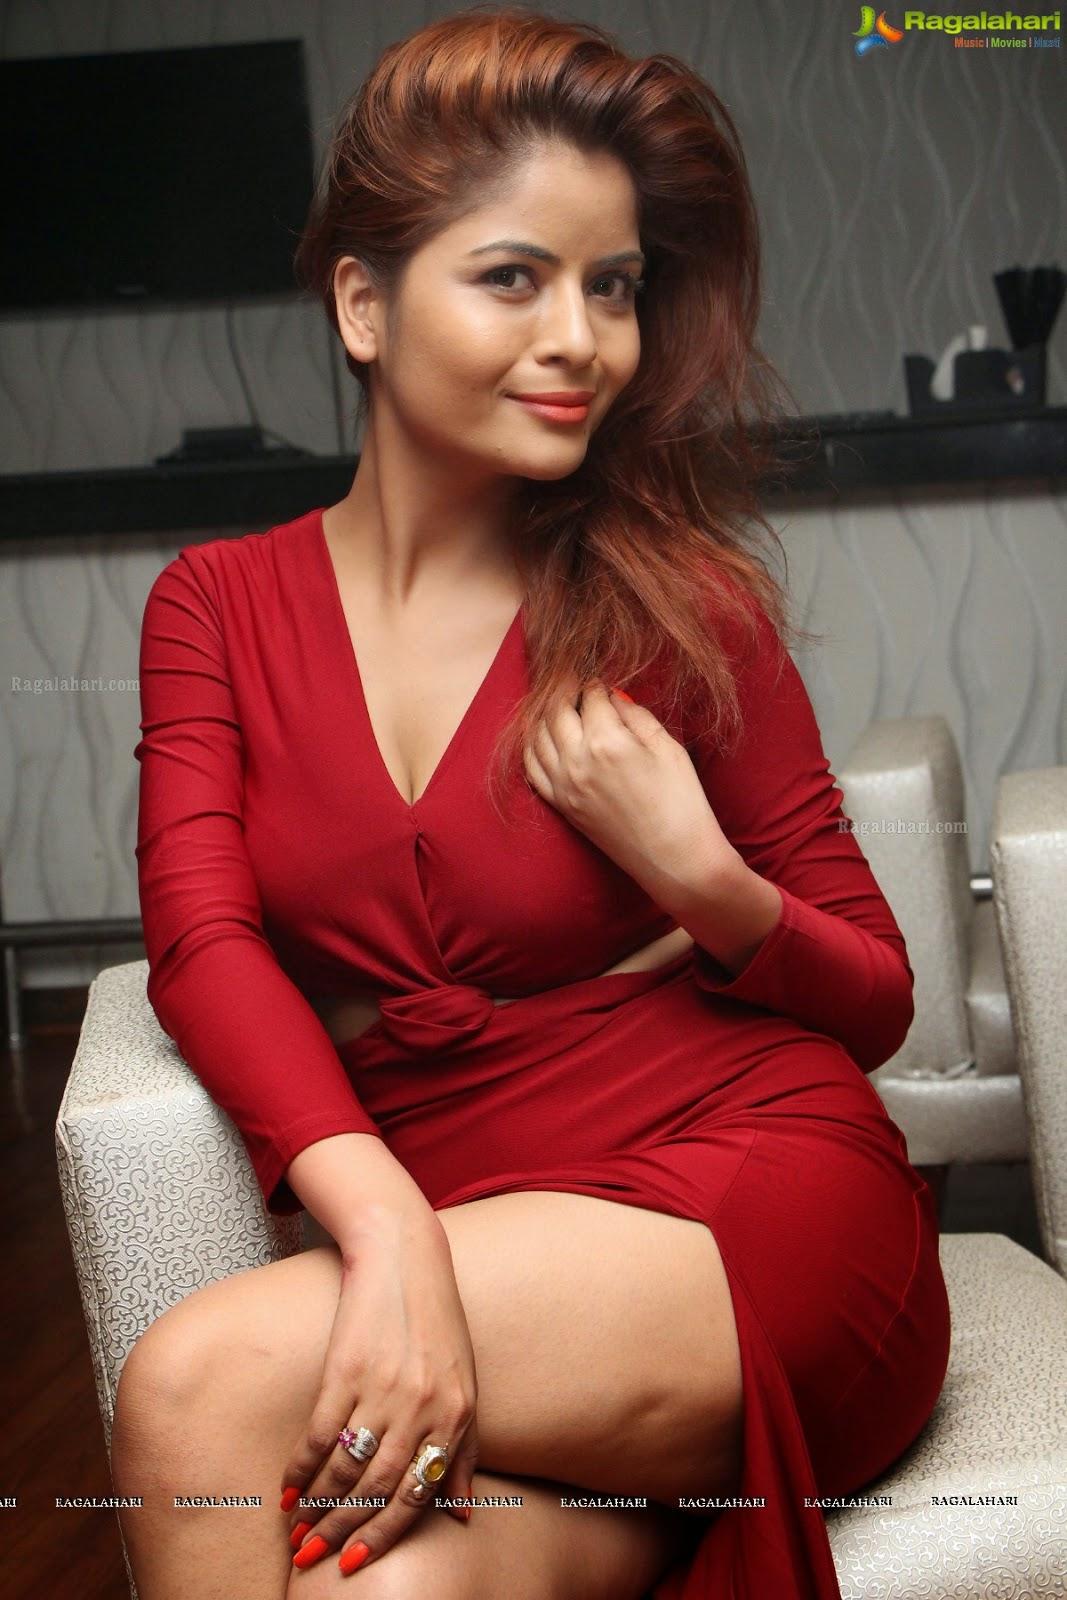 Indian Garam Masala: Actress Gehana Vasisth Spicy Hot red ...